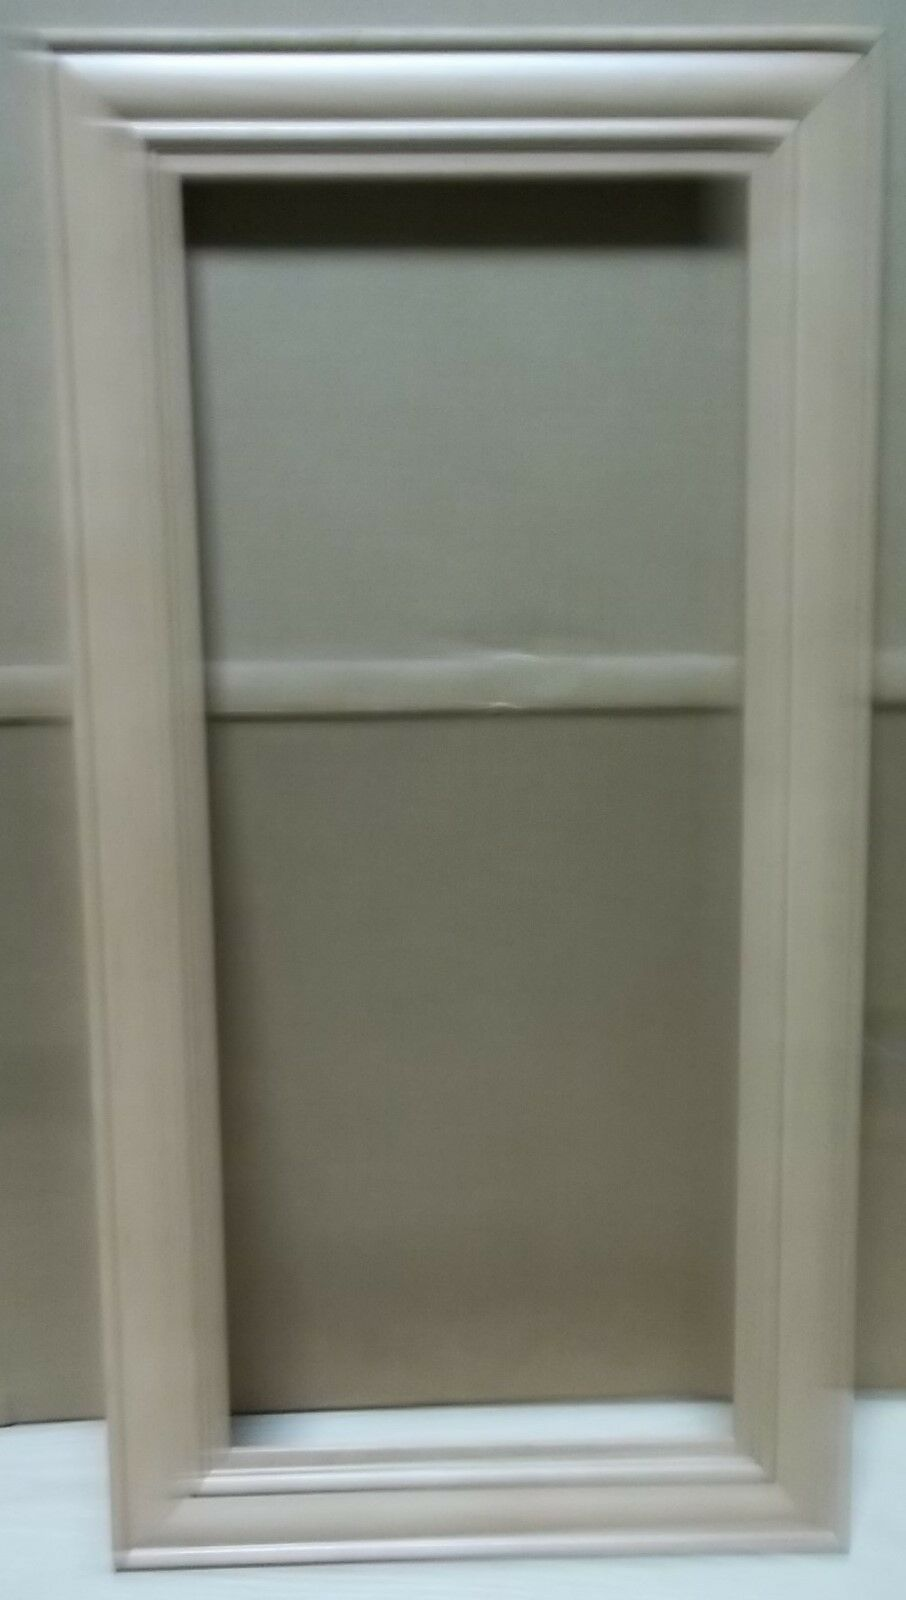 2 FRAME CABINET DOORS PAINT GRADE MAPLE OPEN FRAME 15 X 28 3 4